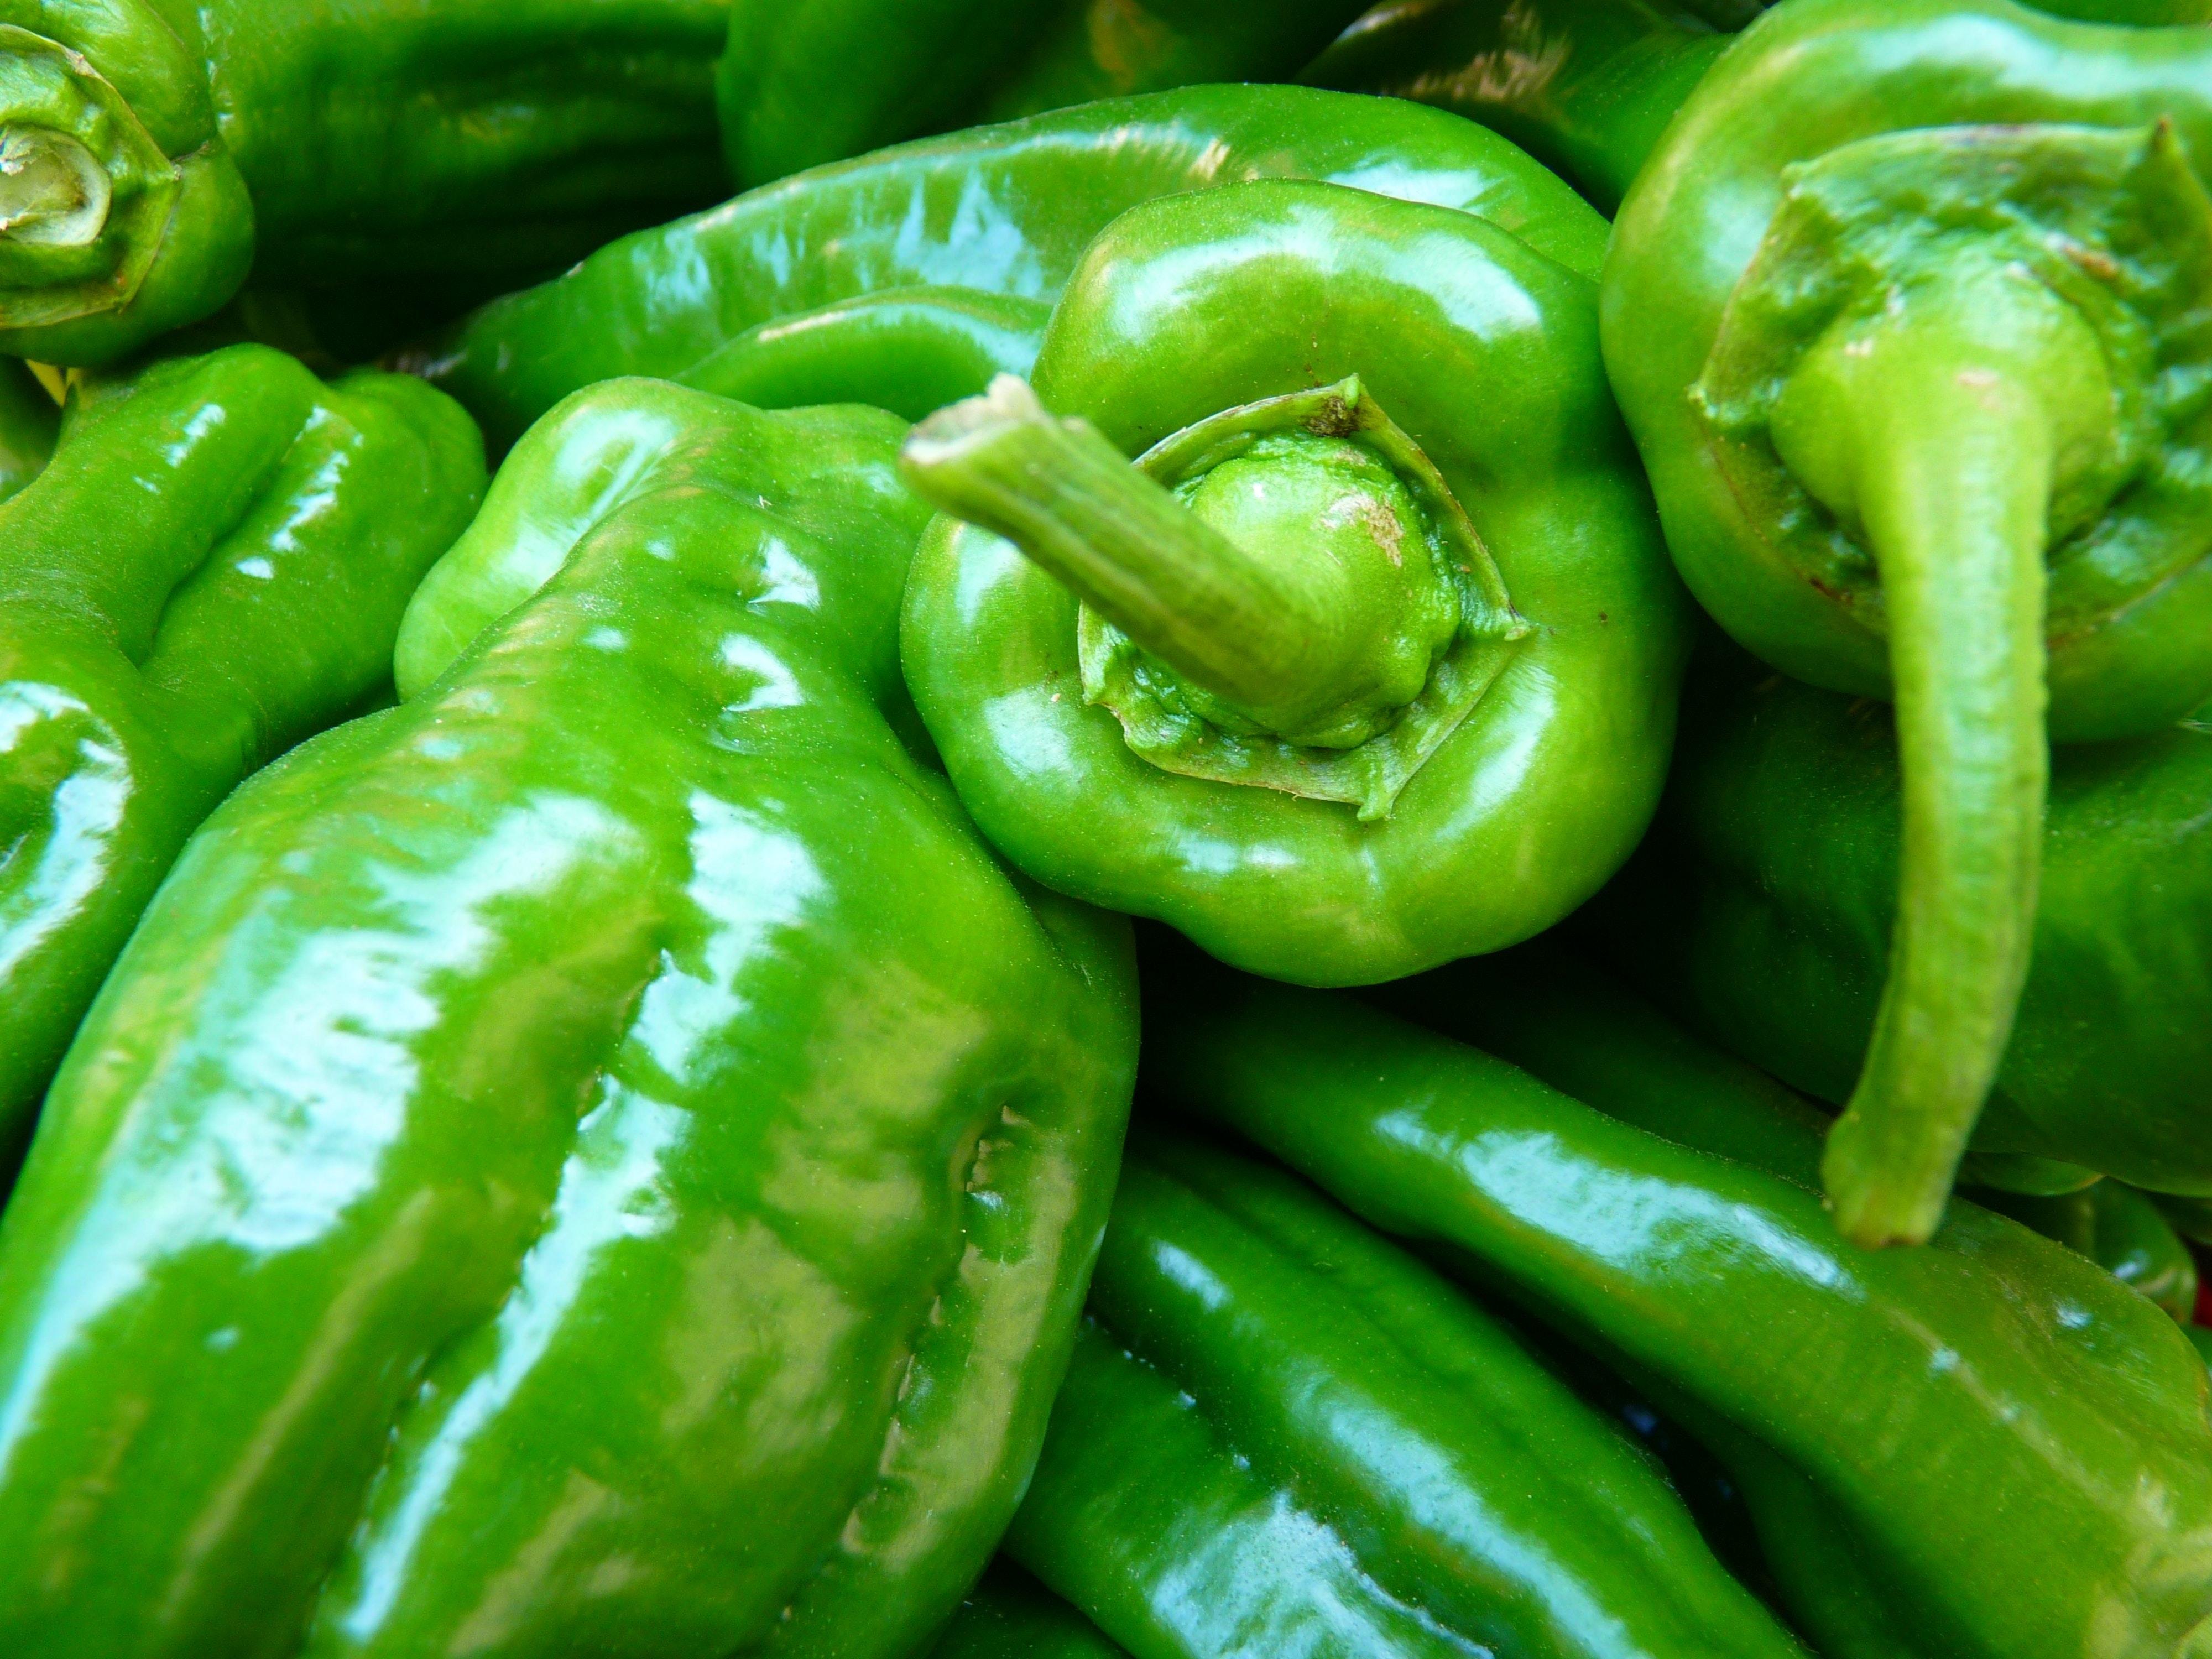 close-up-food-green-87626.jpg